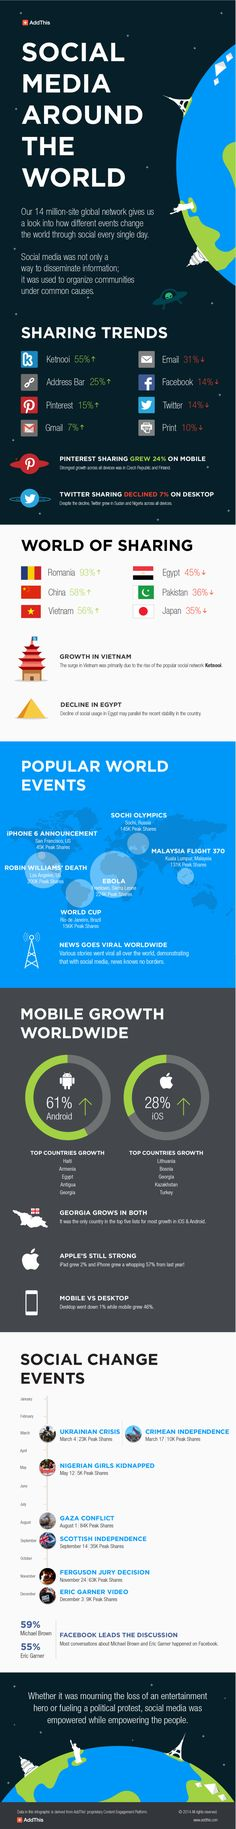 #SocialMedia around the world [ #infographic ]